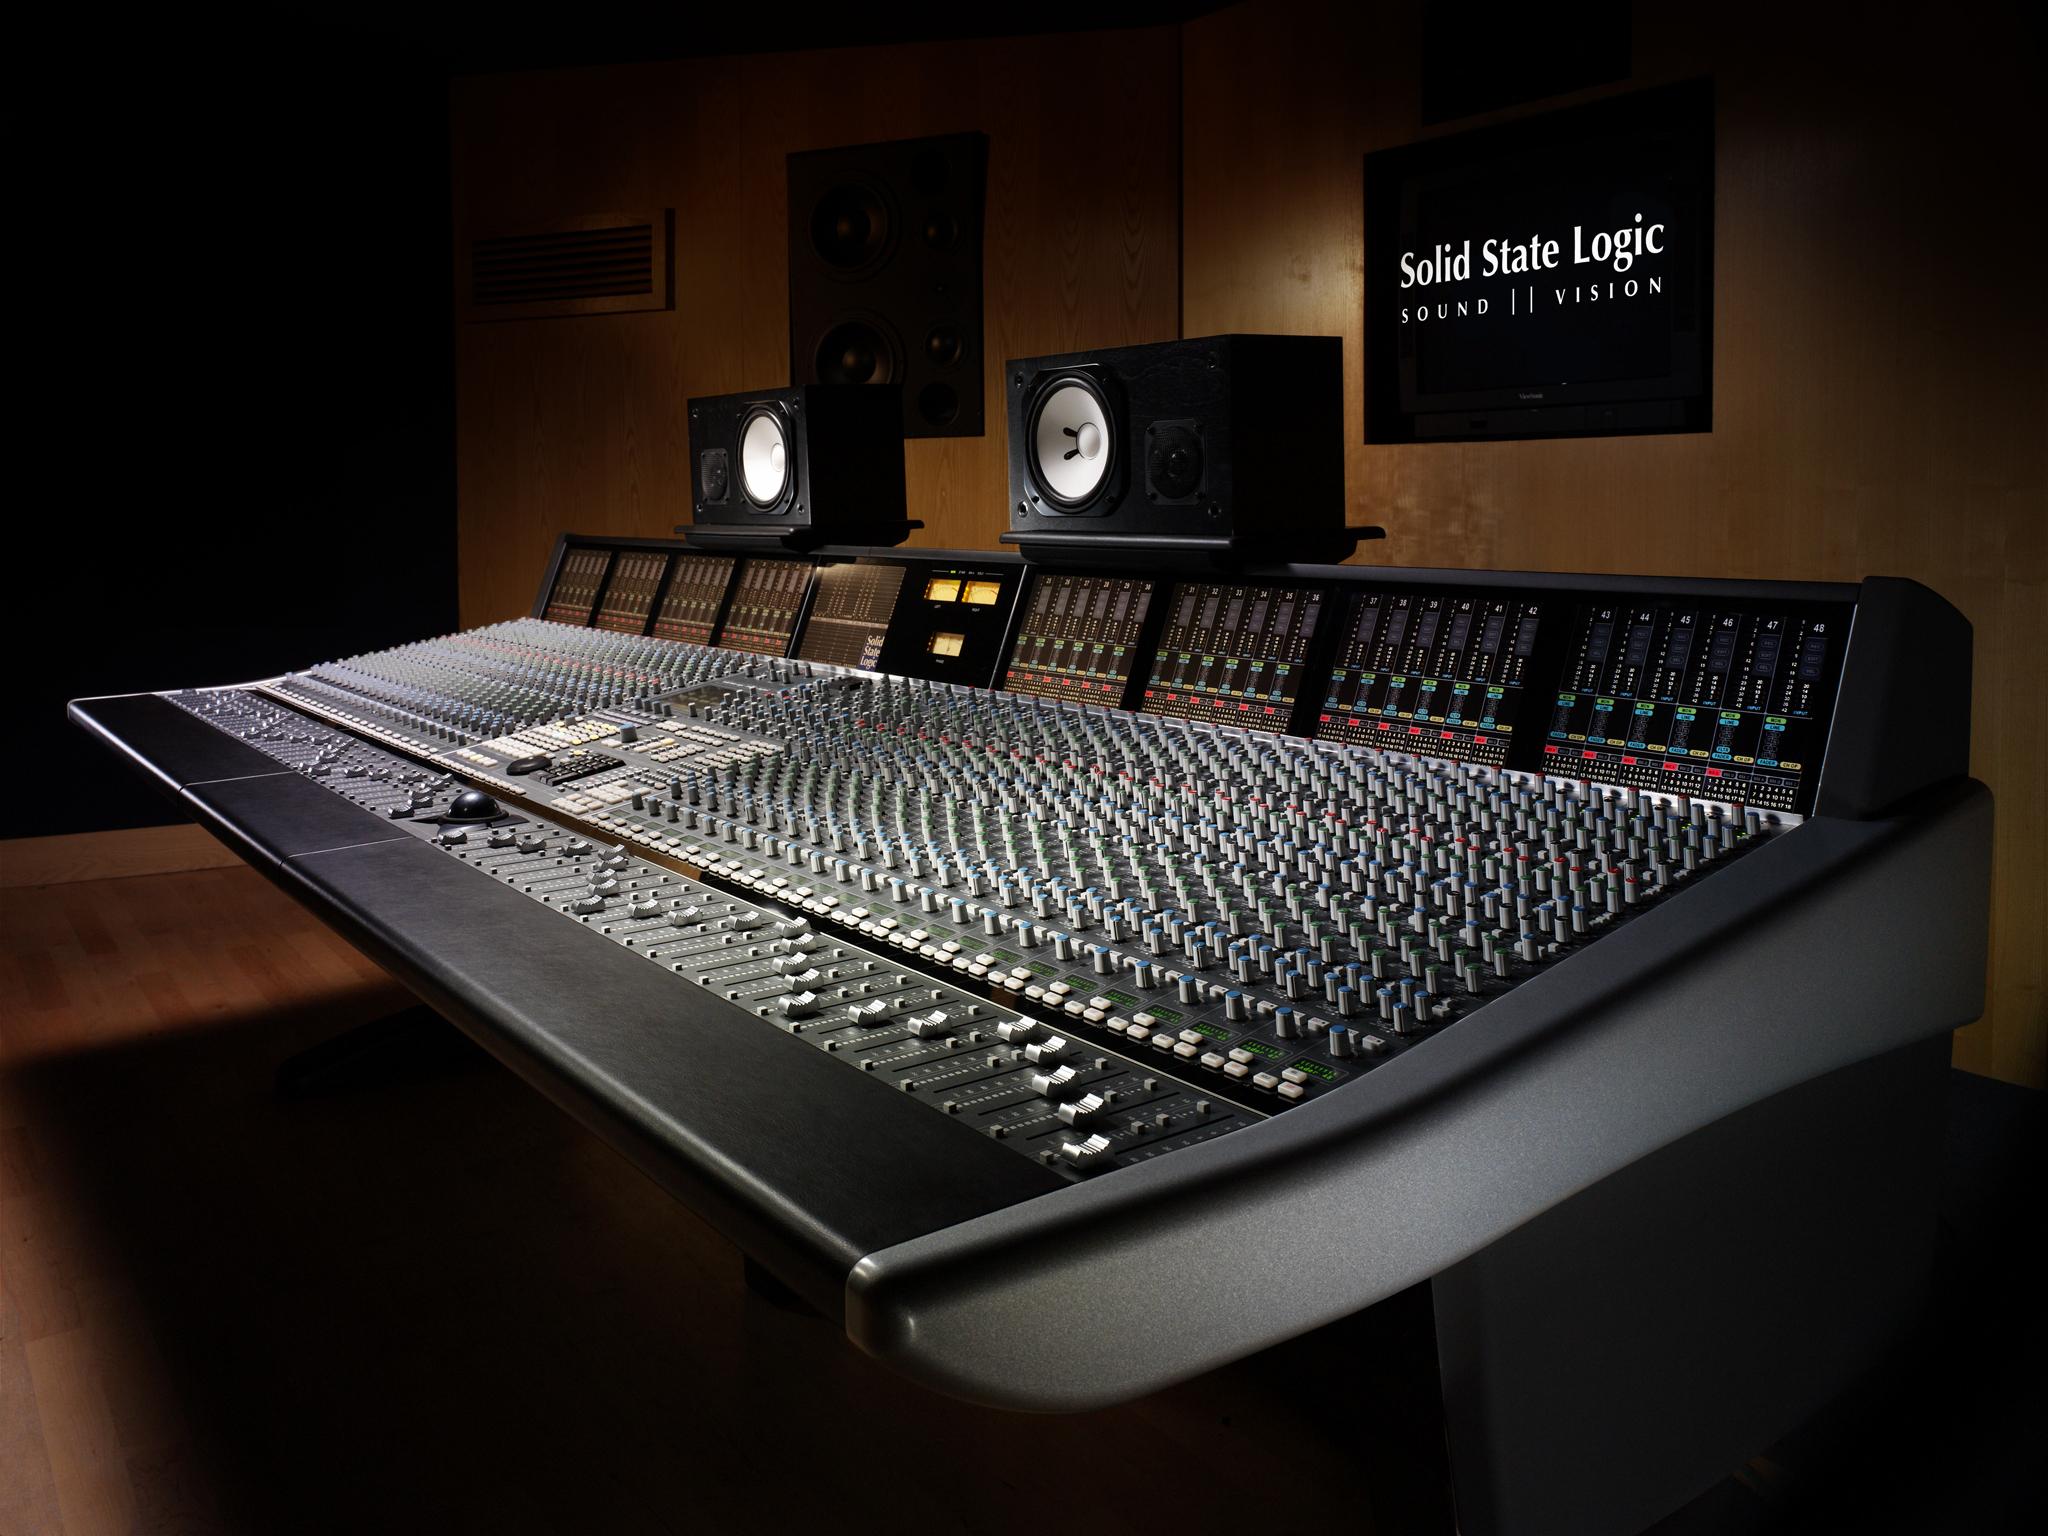 Music studio mixing tables sound wallpaper 2048x1536 19364 2048x1536